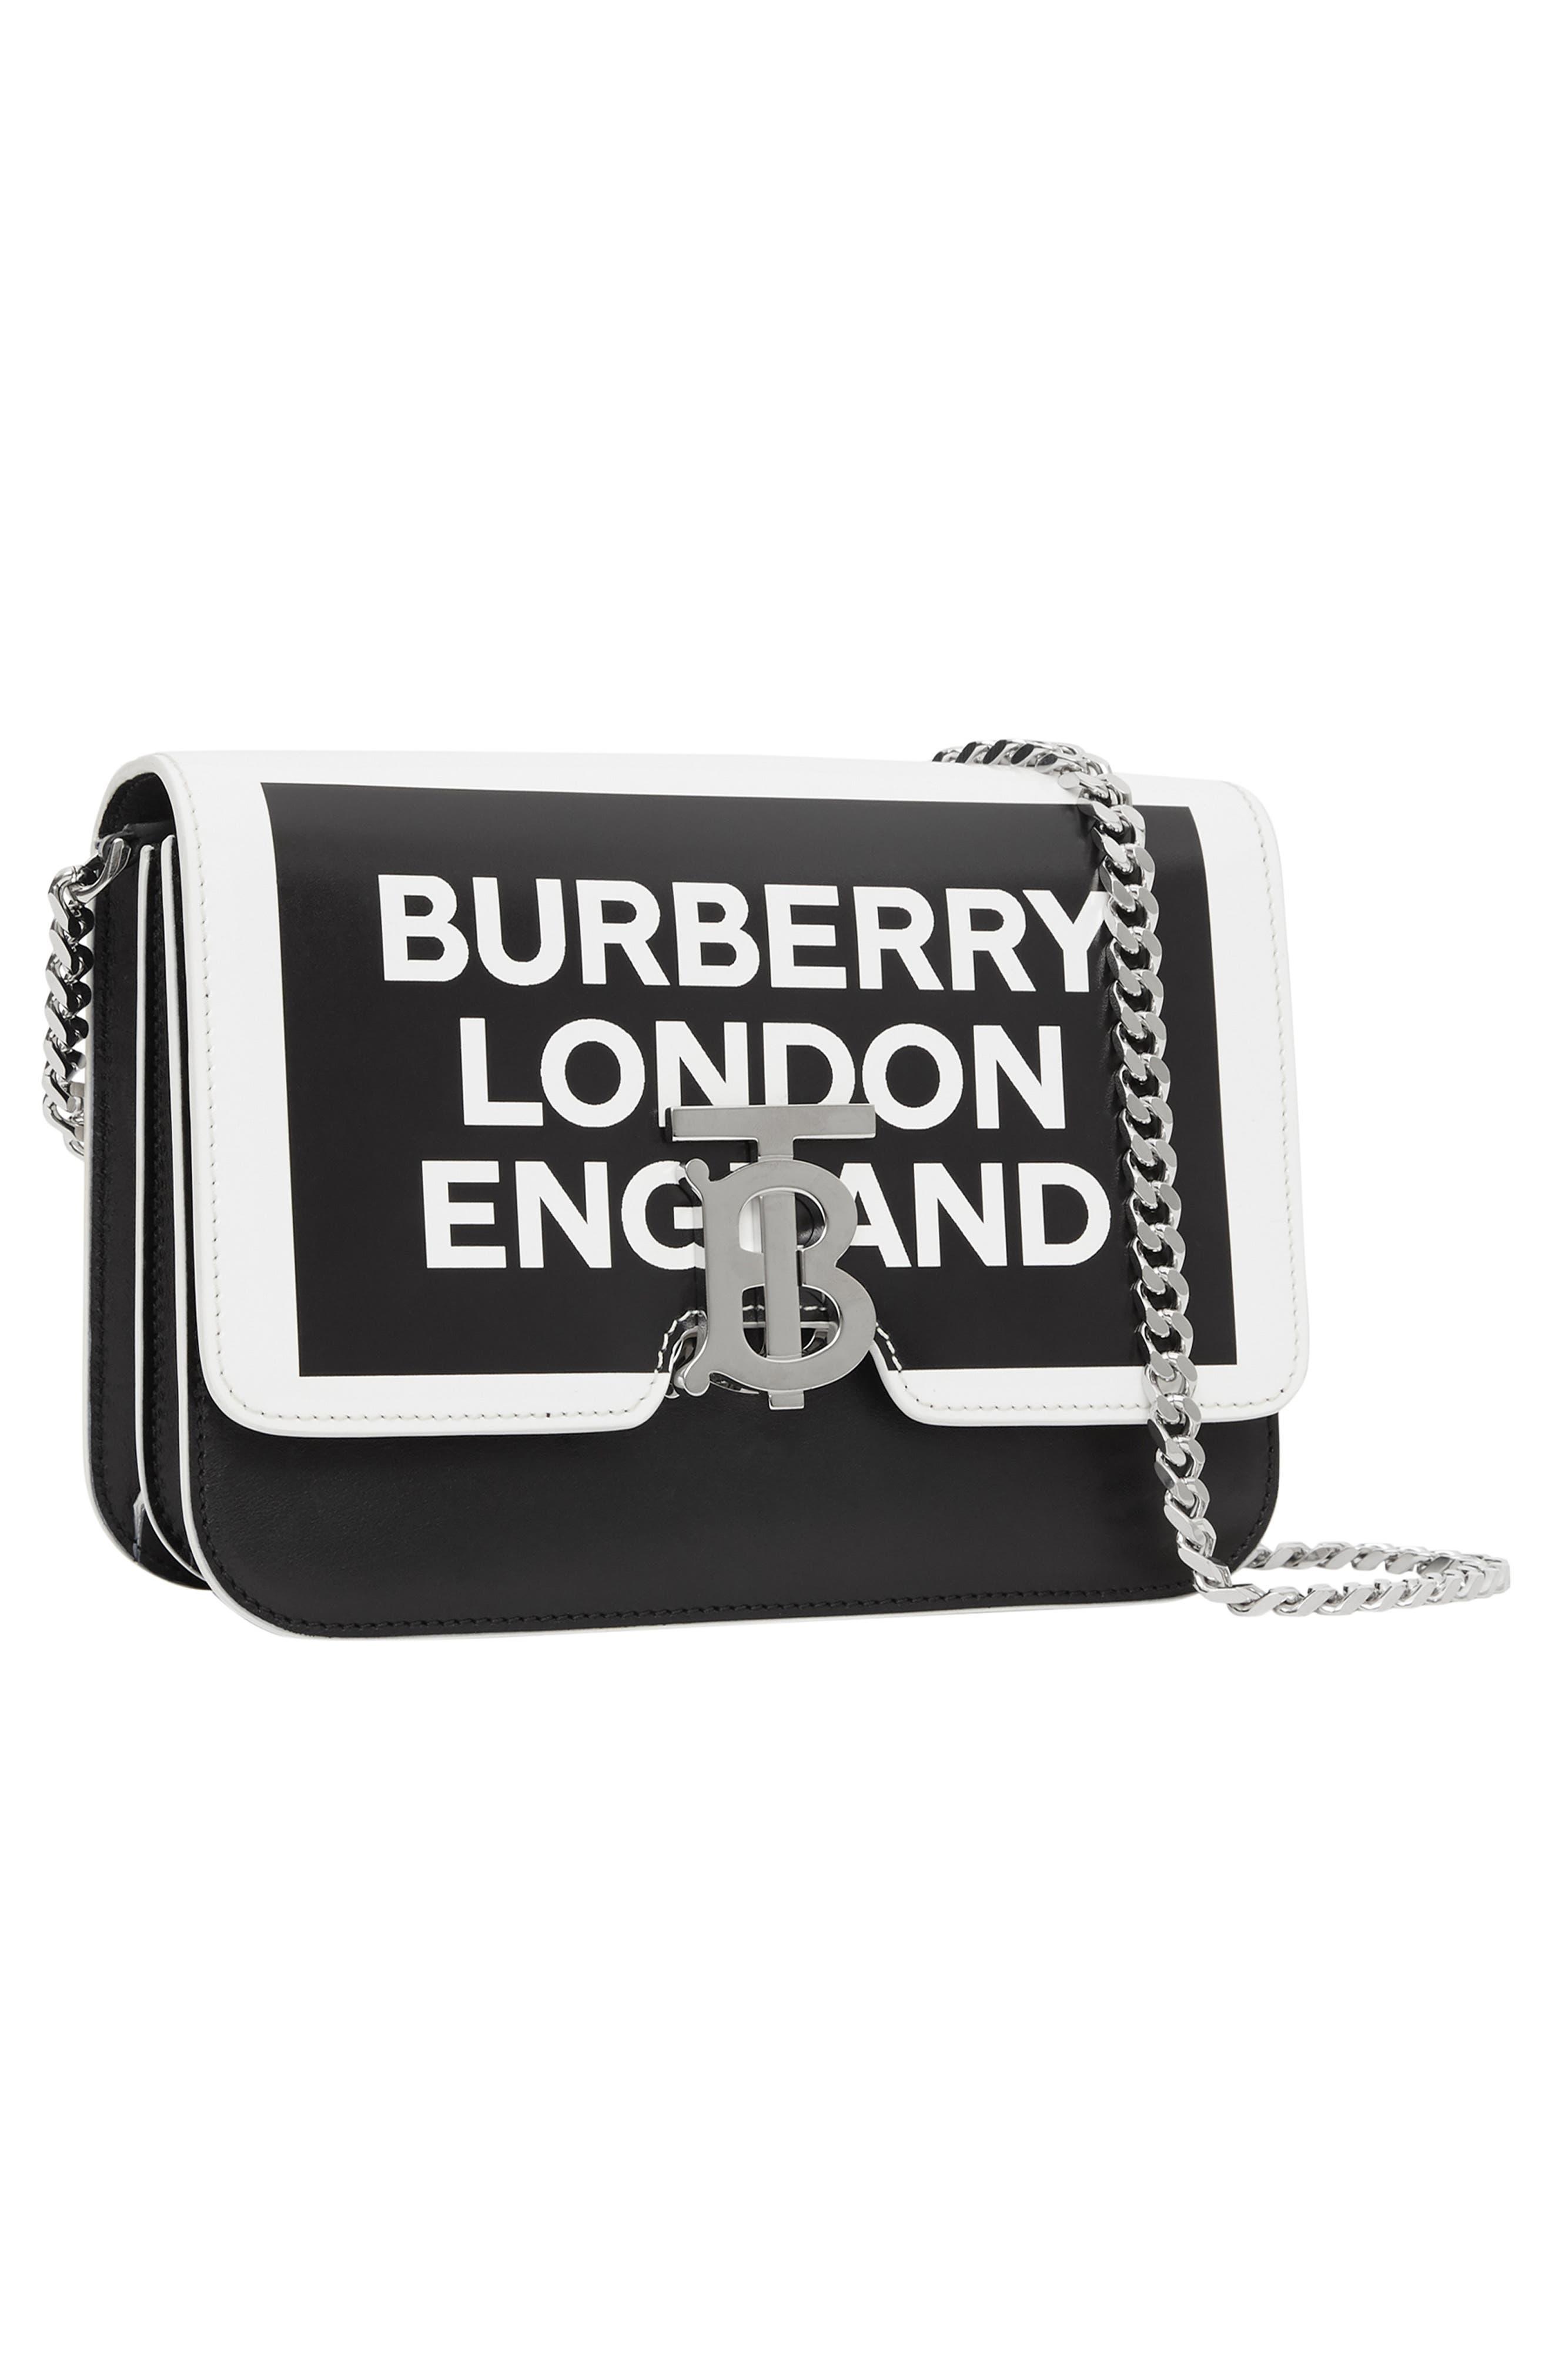 BURBERRY, Small Painted Edge Logo TB Crossbody Bag, Alternate thumbnail 6, color, 001